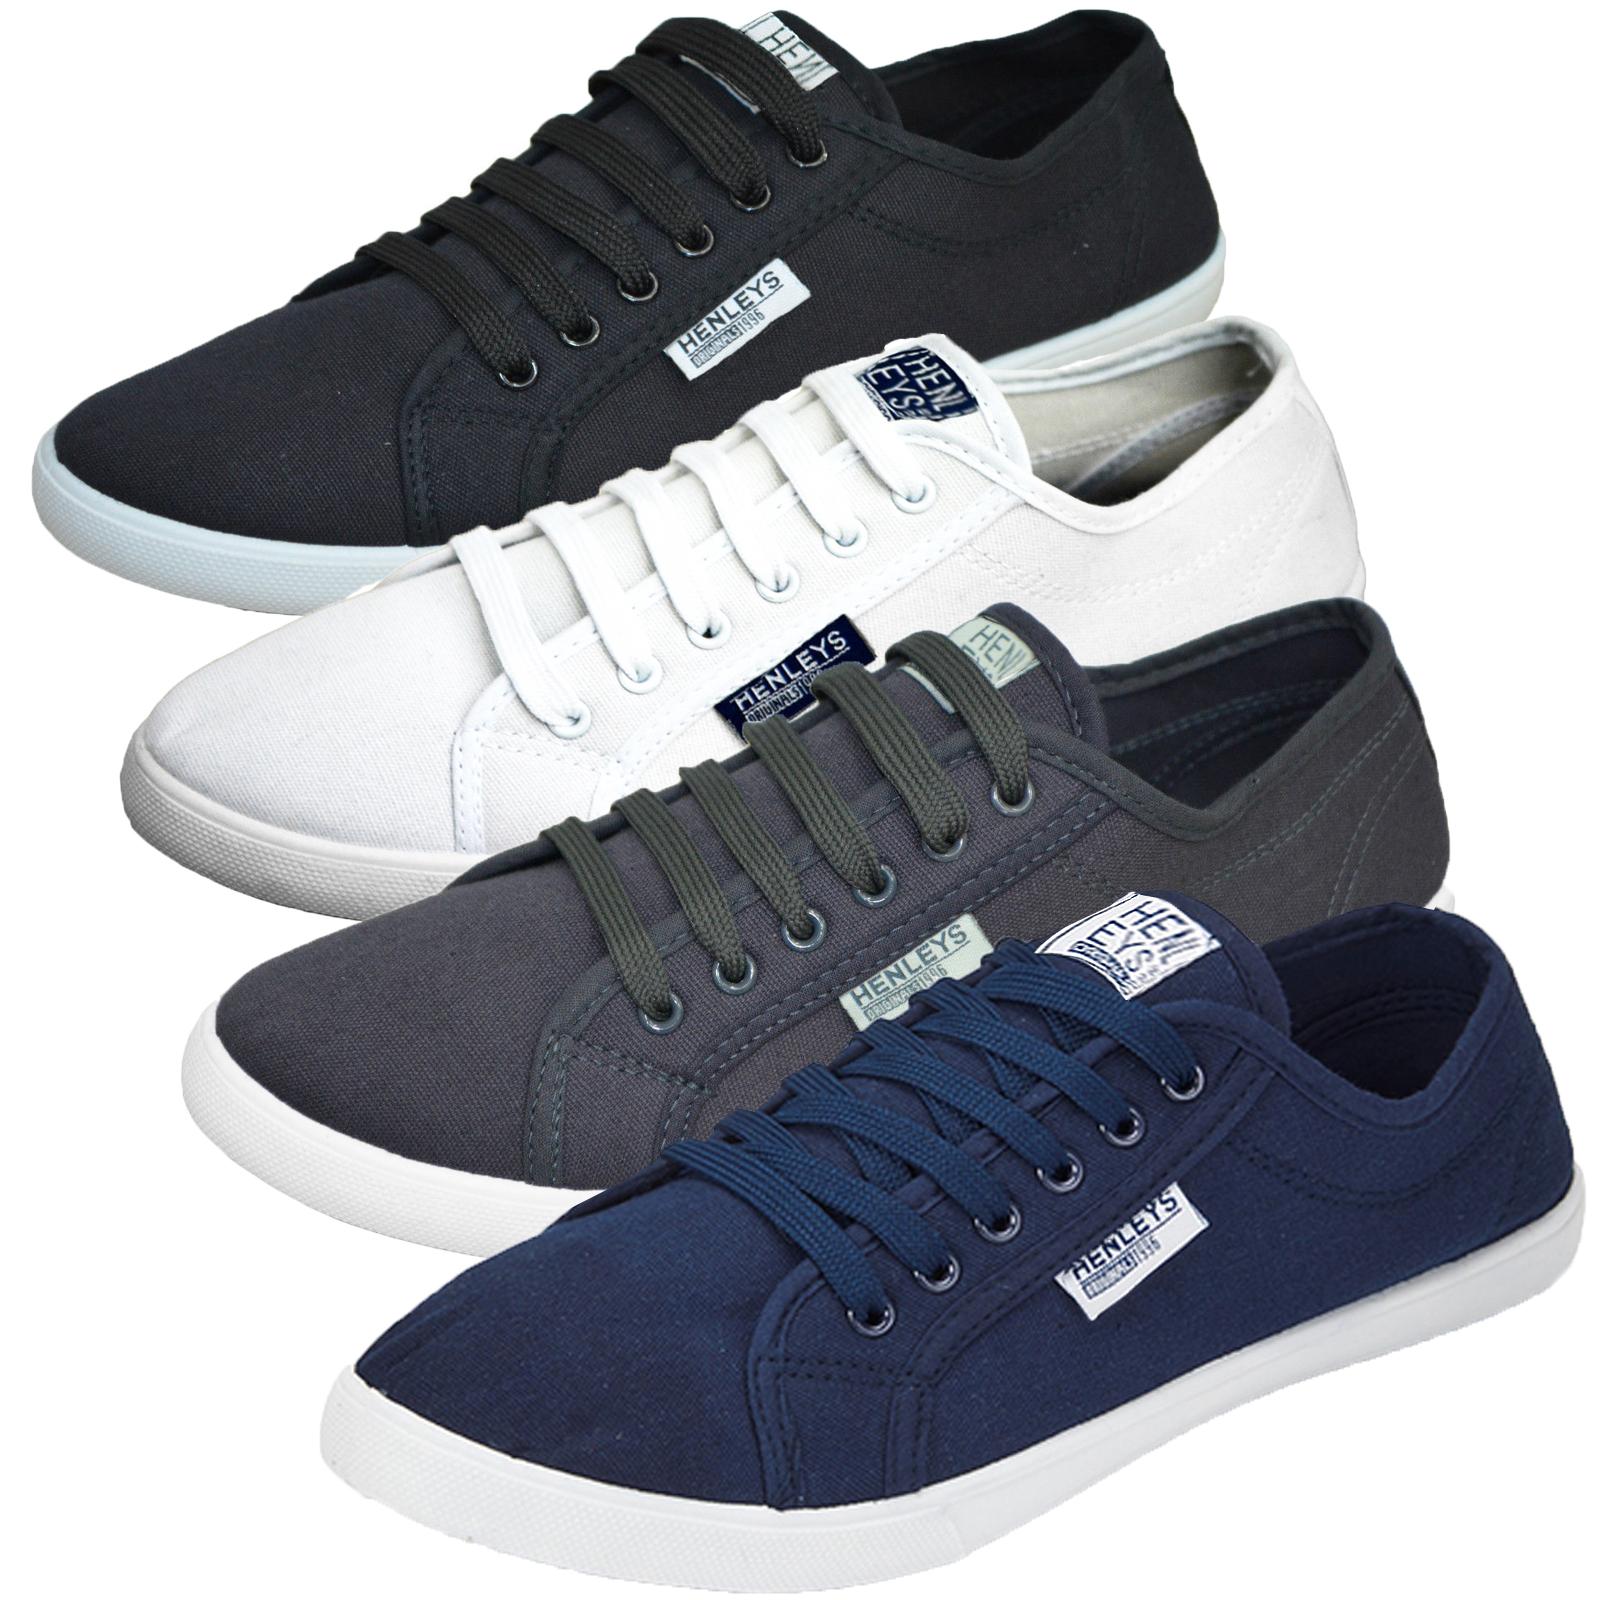 henleys kenyon mens canvas shoes new designer lace up